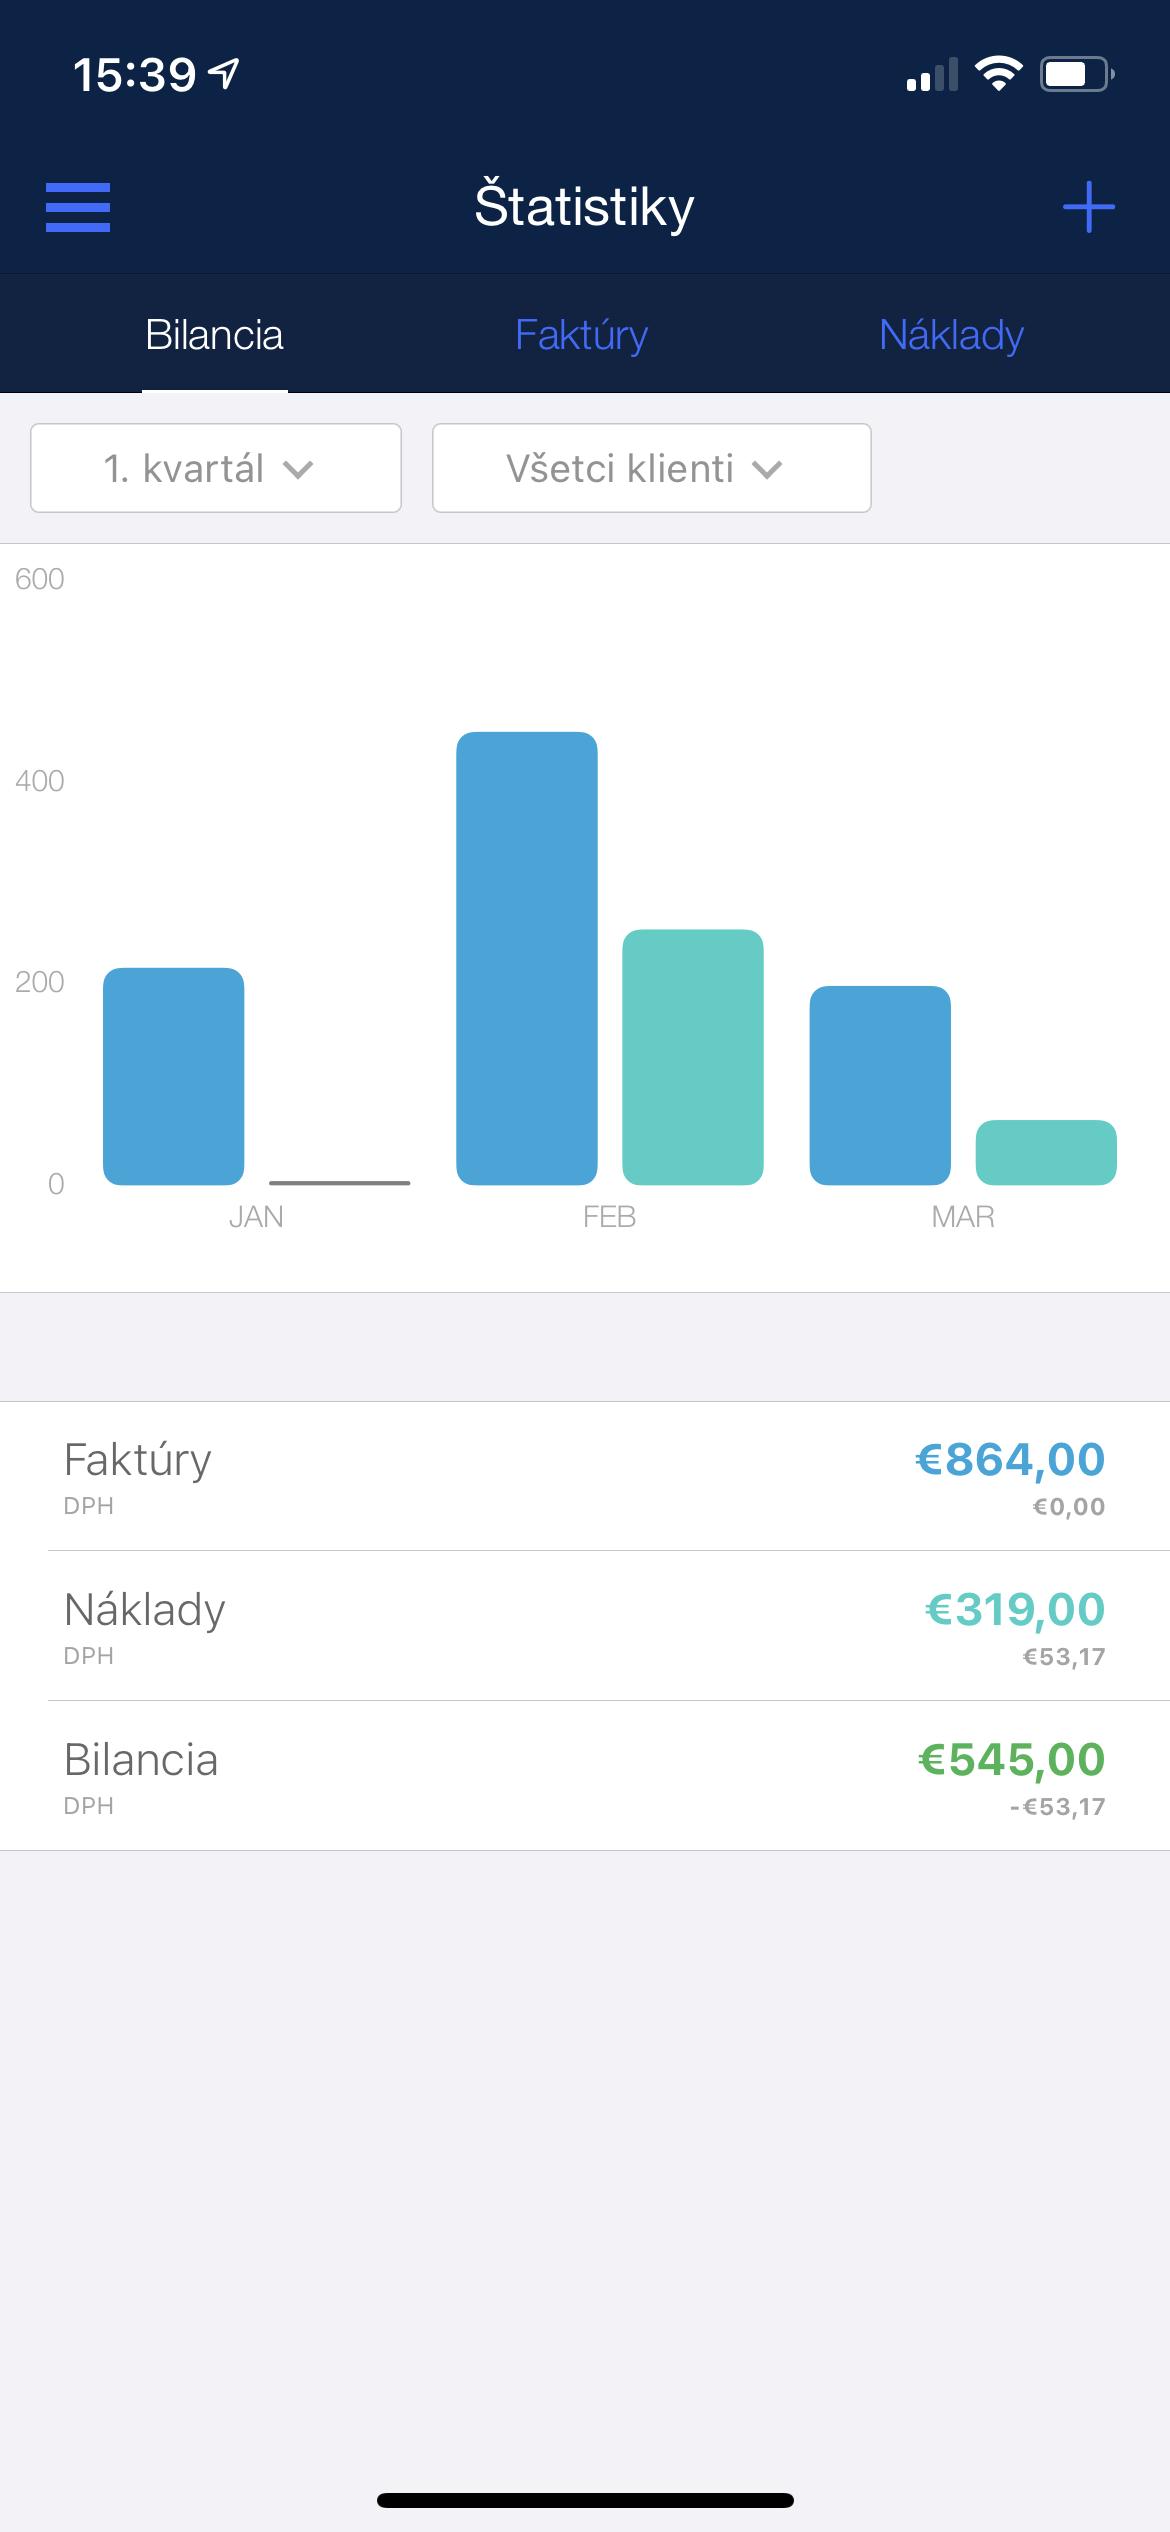 Billdu_Fakturacia - statistiky